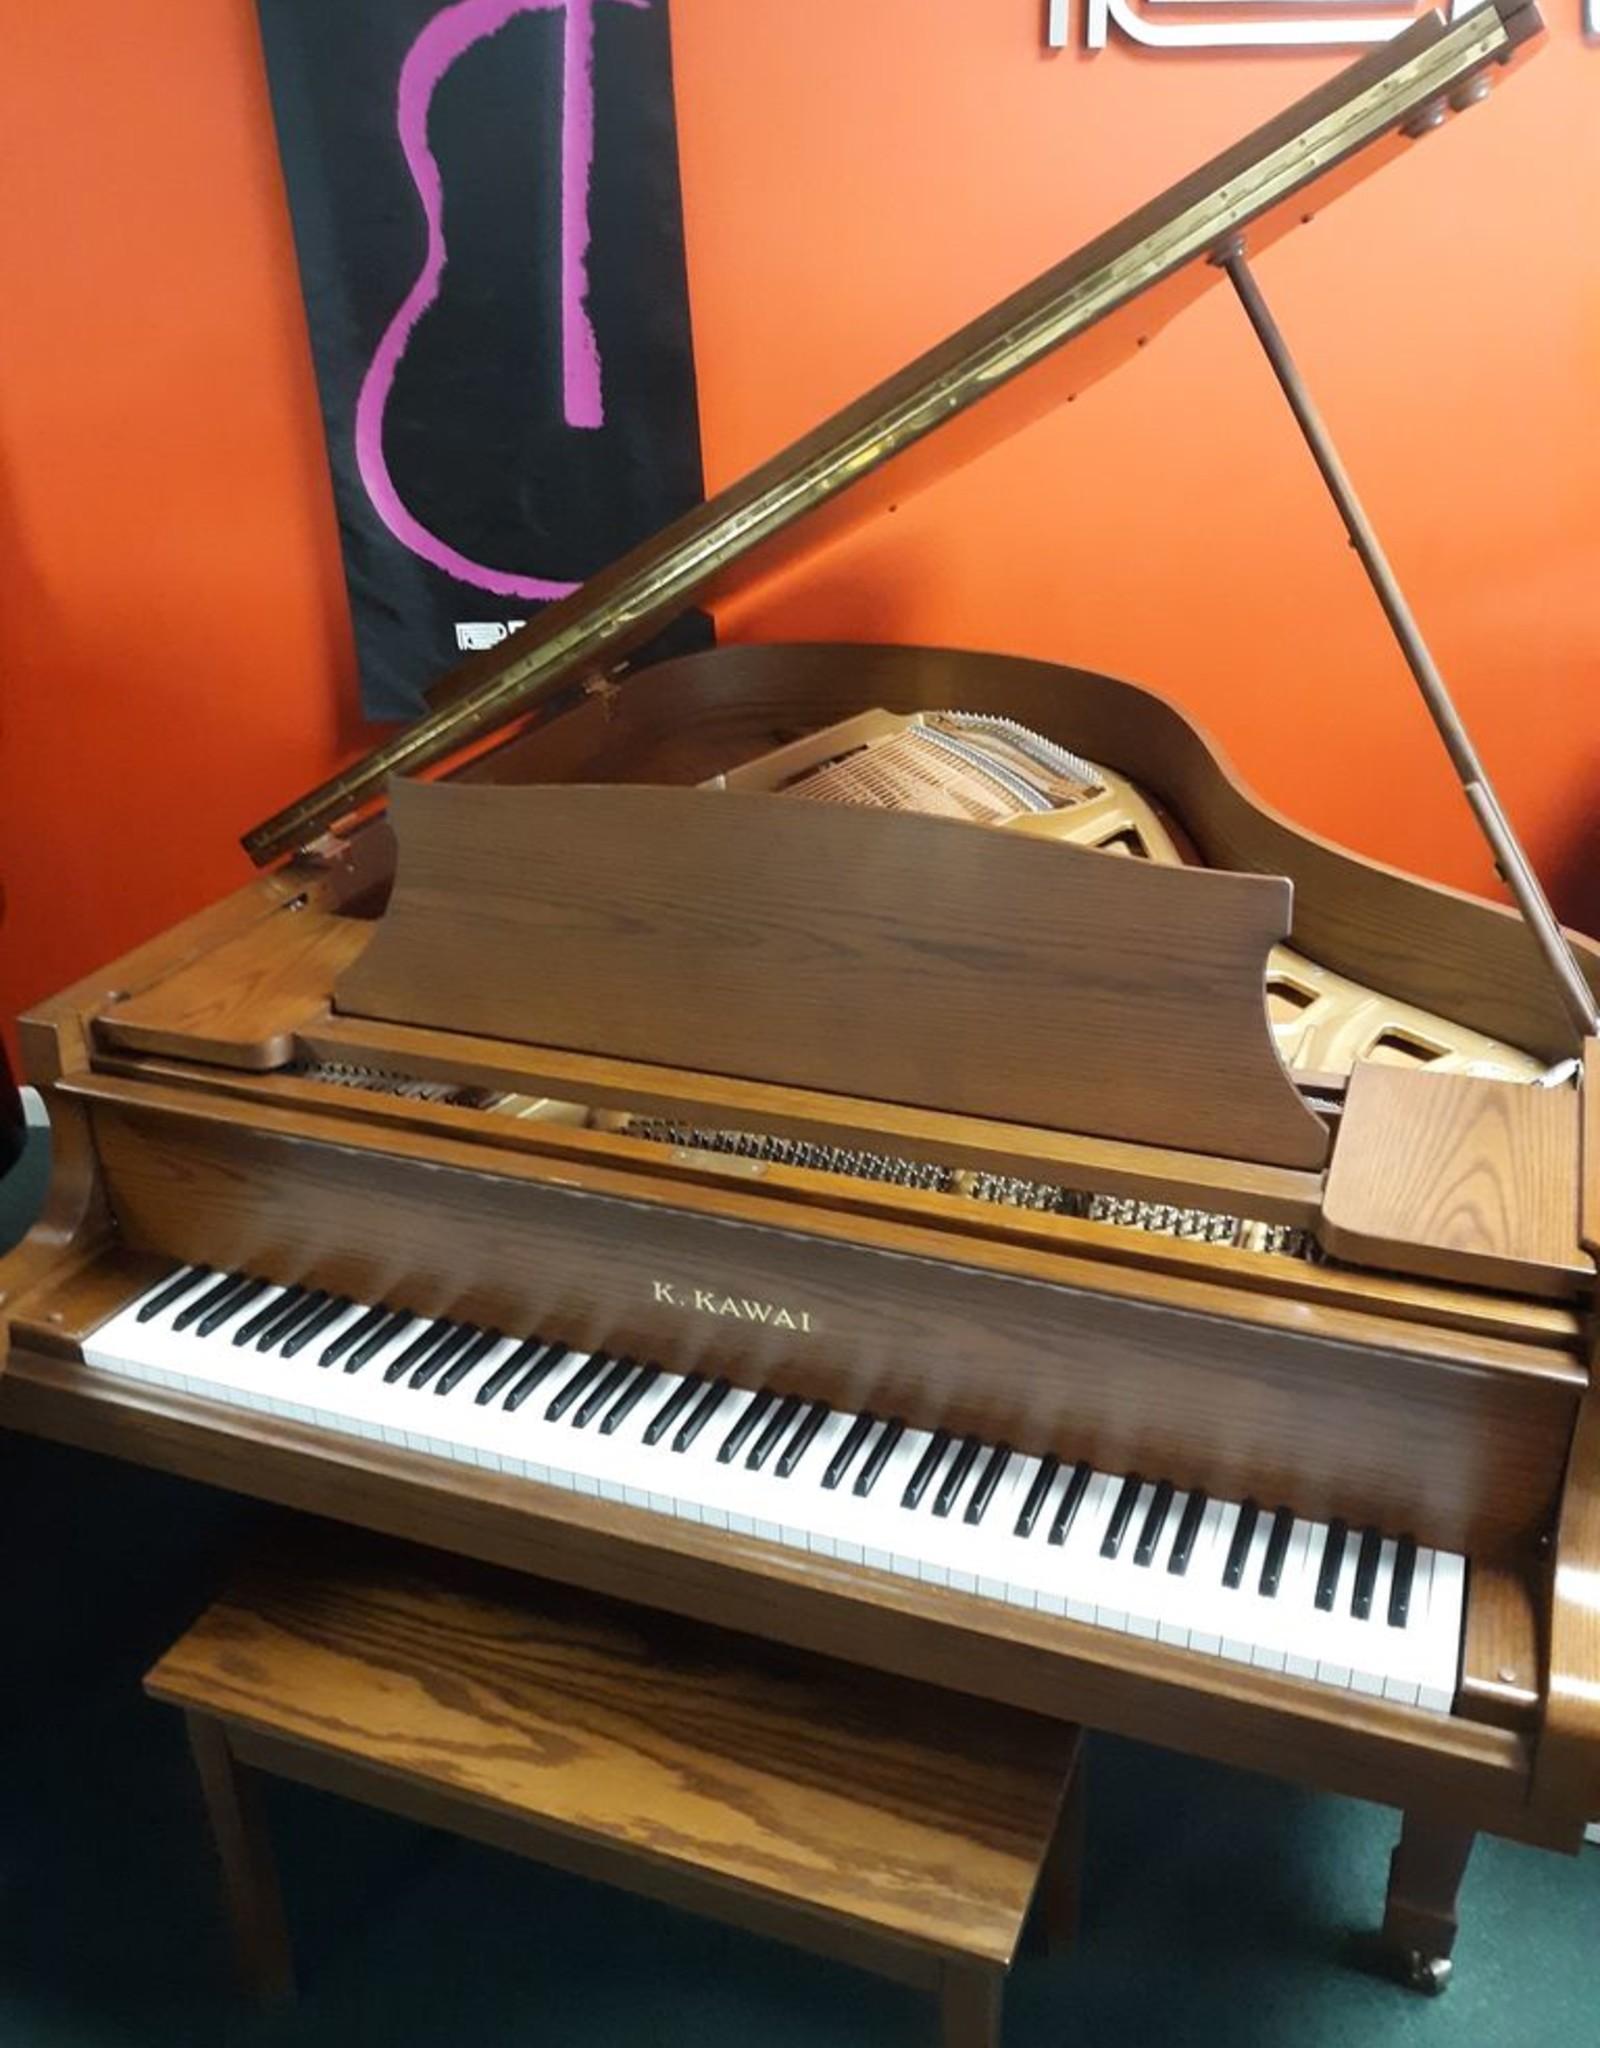 "Kawai K. Kawai KG-2E 5'9"" Grand Piano (Oak) (pre-owned)"